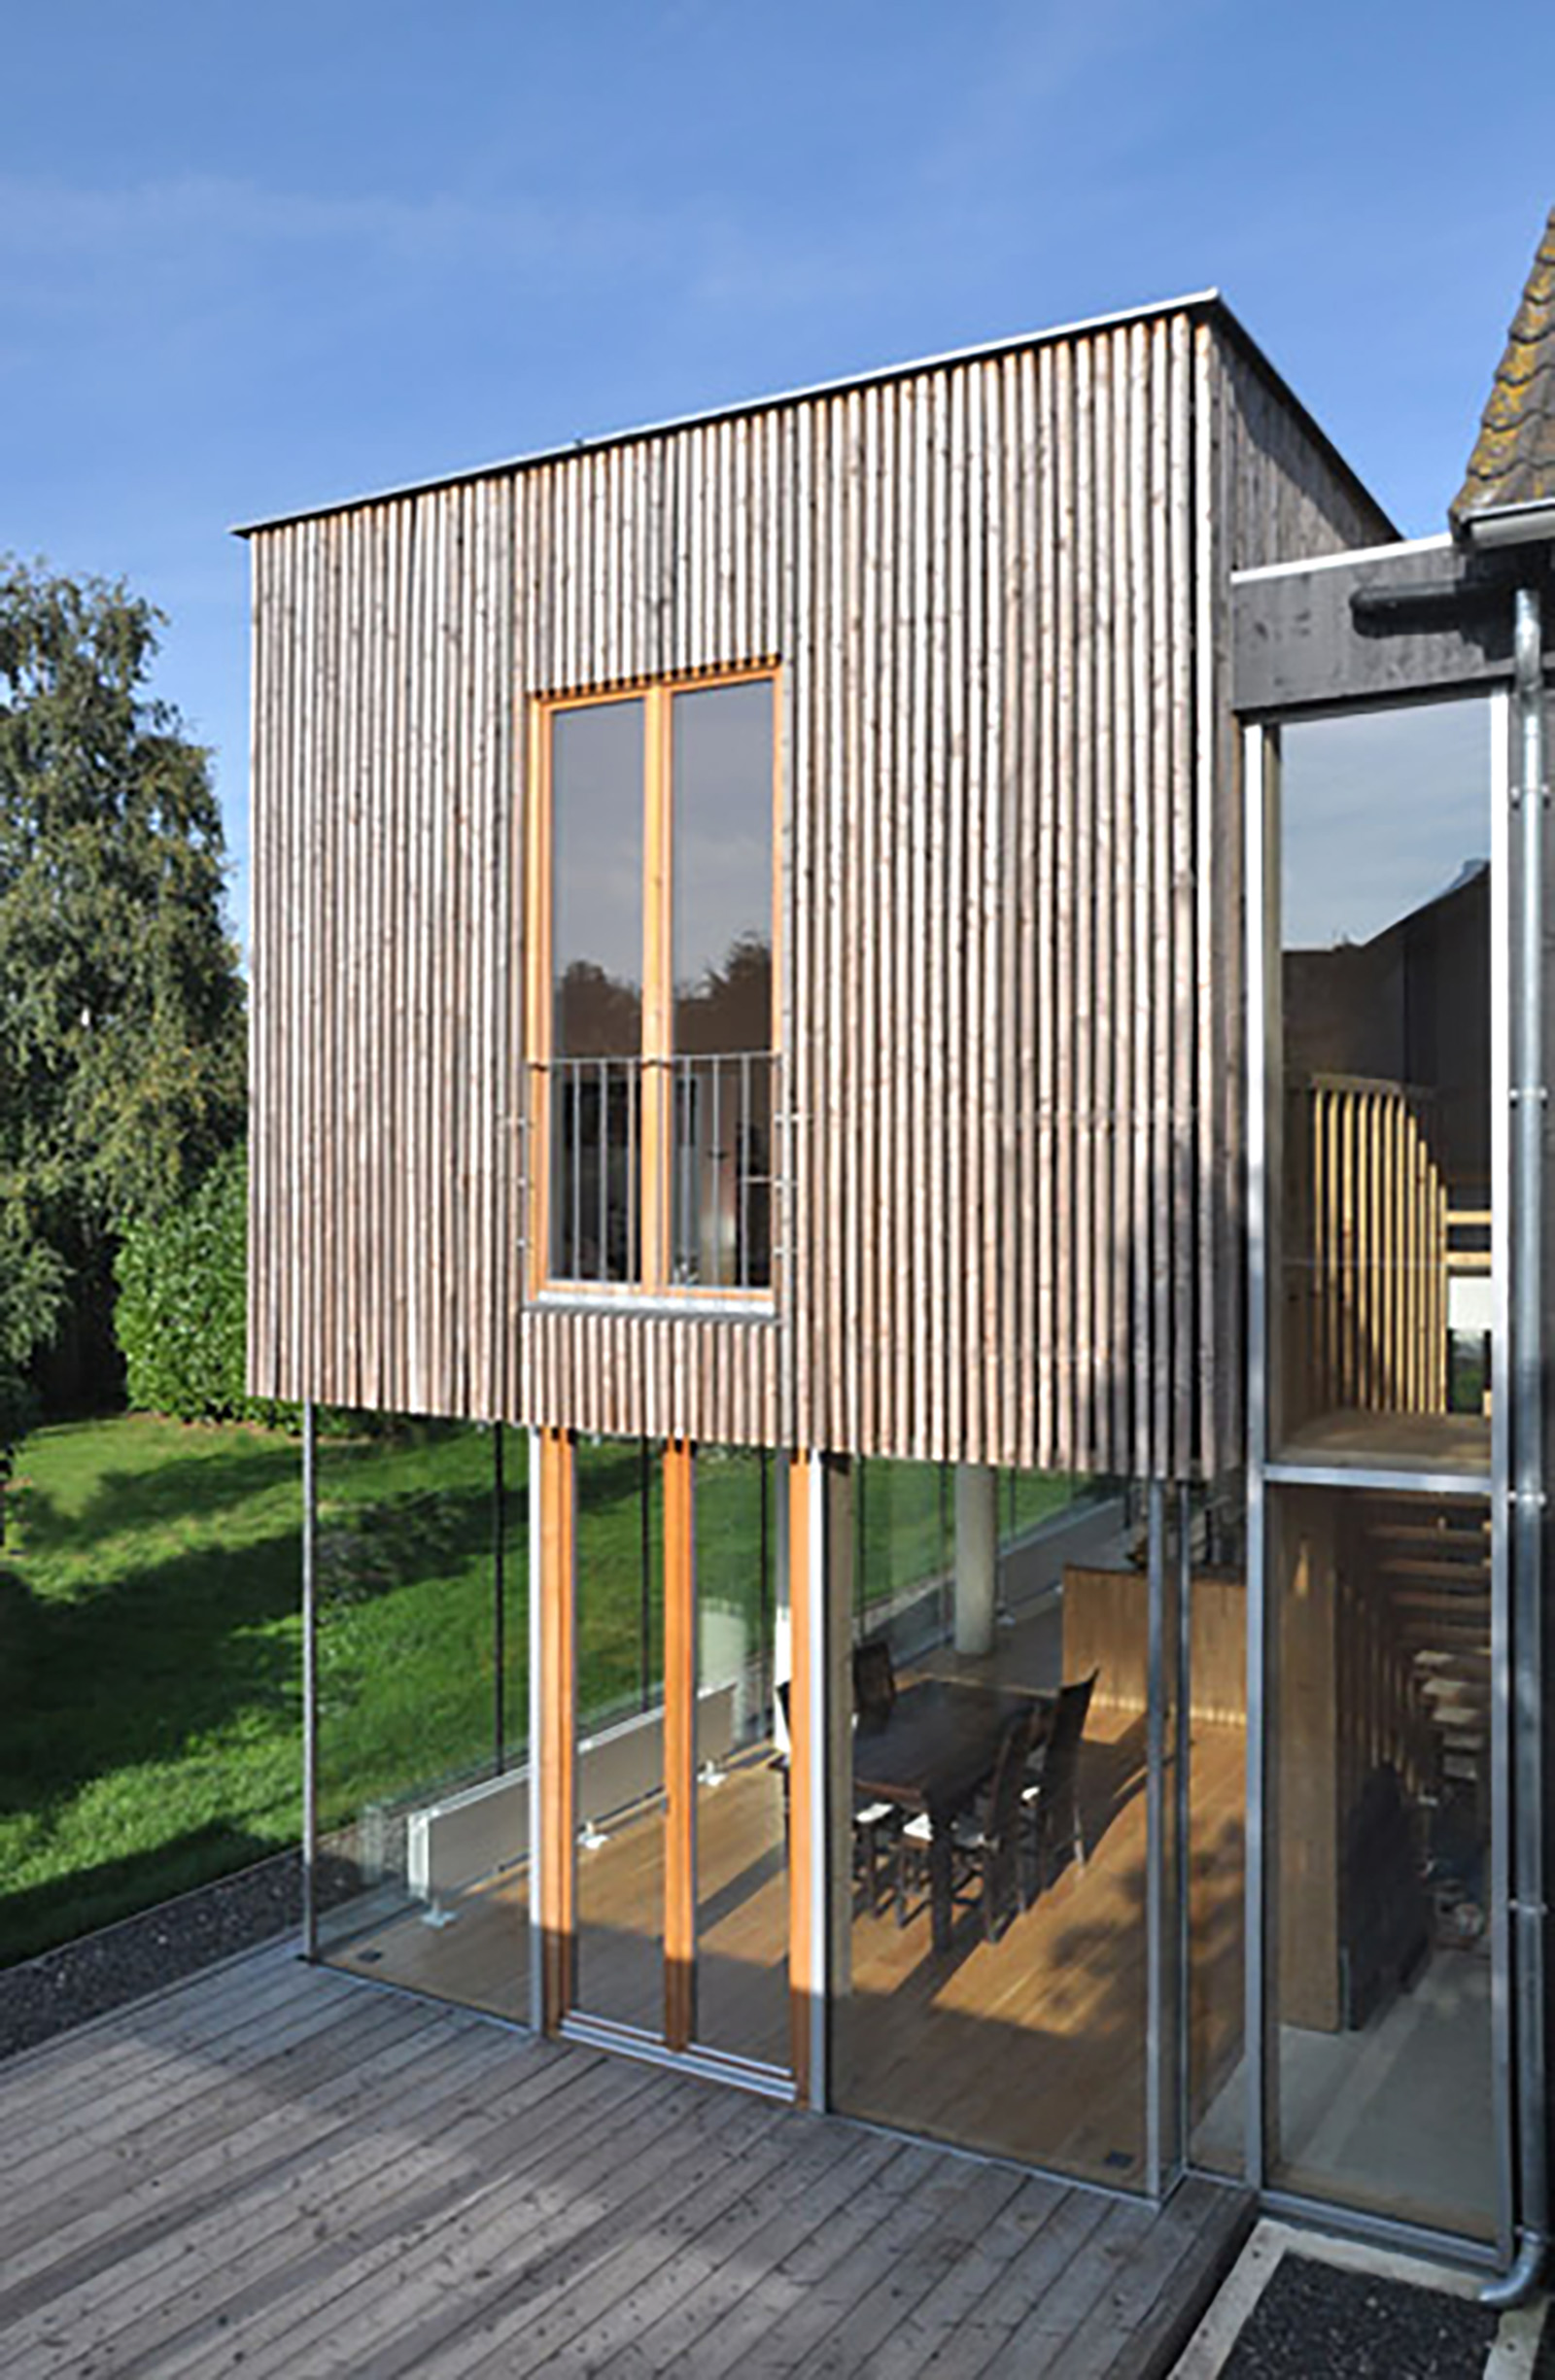 Haus es s aachen richterich holzhueter architektur for Holzkubus haus